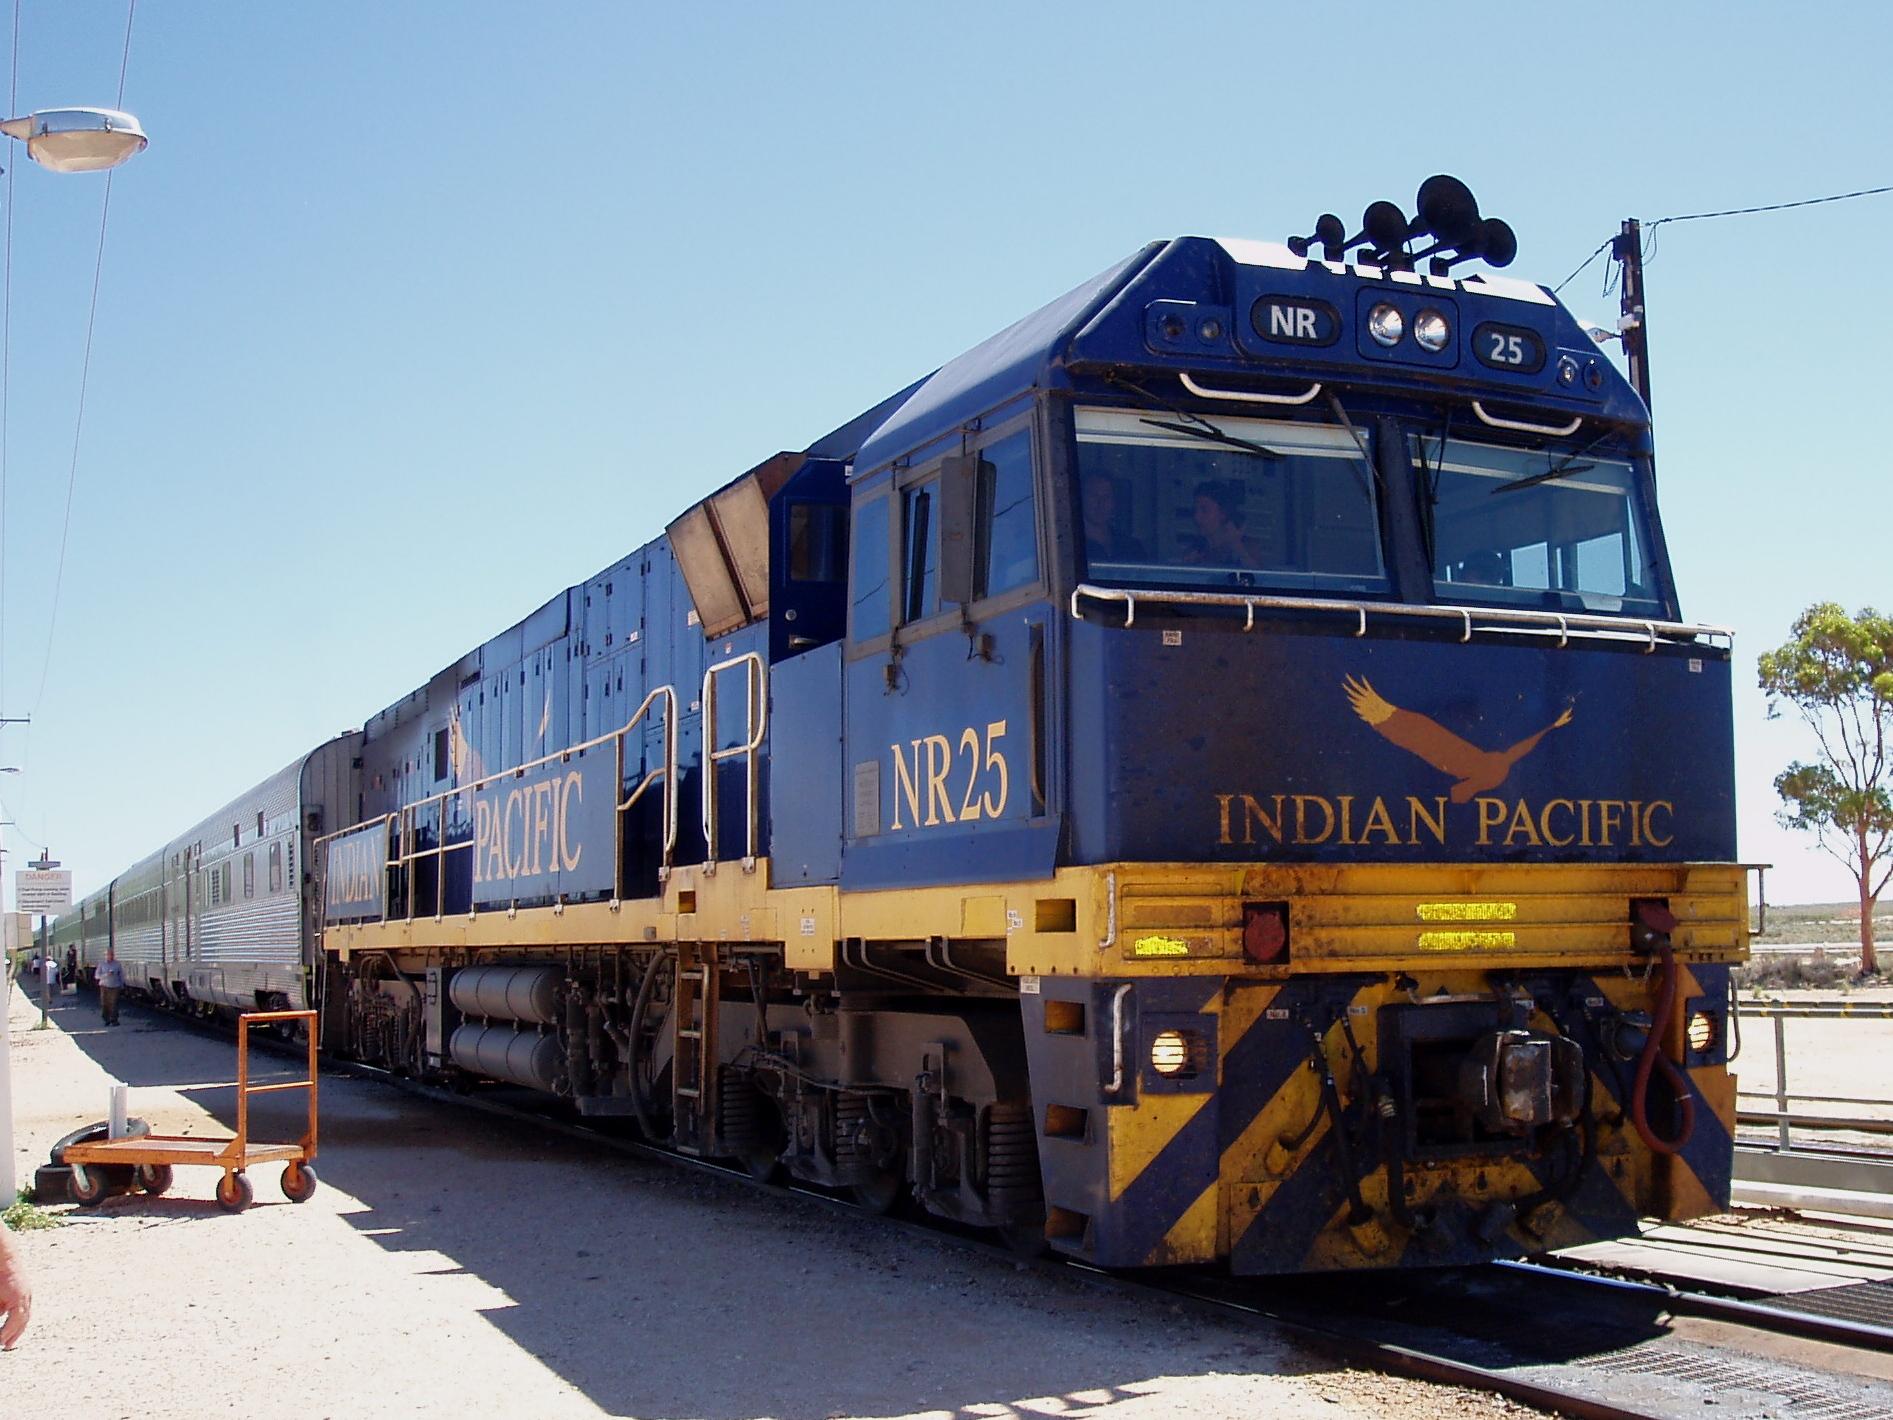 Australian Train Travel Sydney To Brisbane